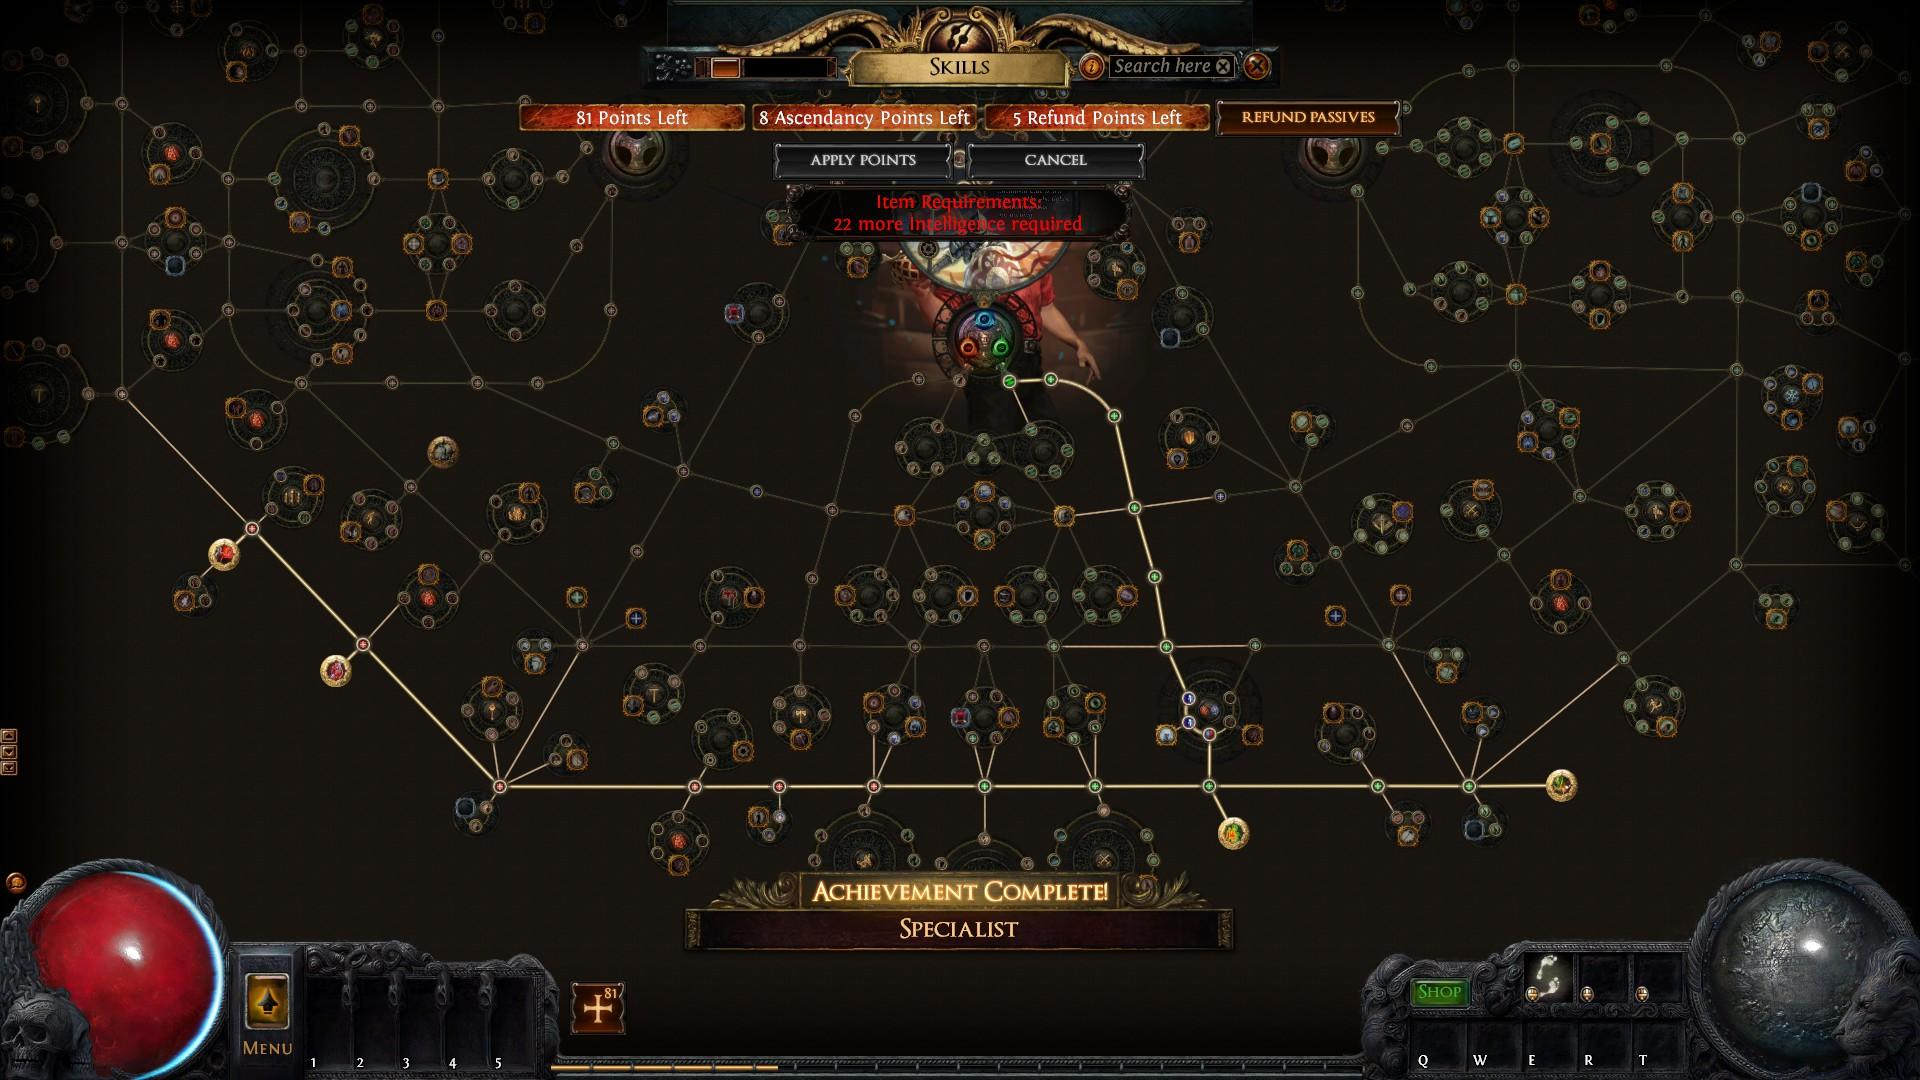 Path of Exile - 100% Achievement Guide